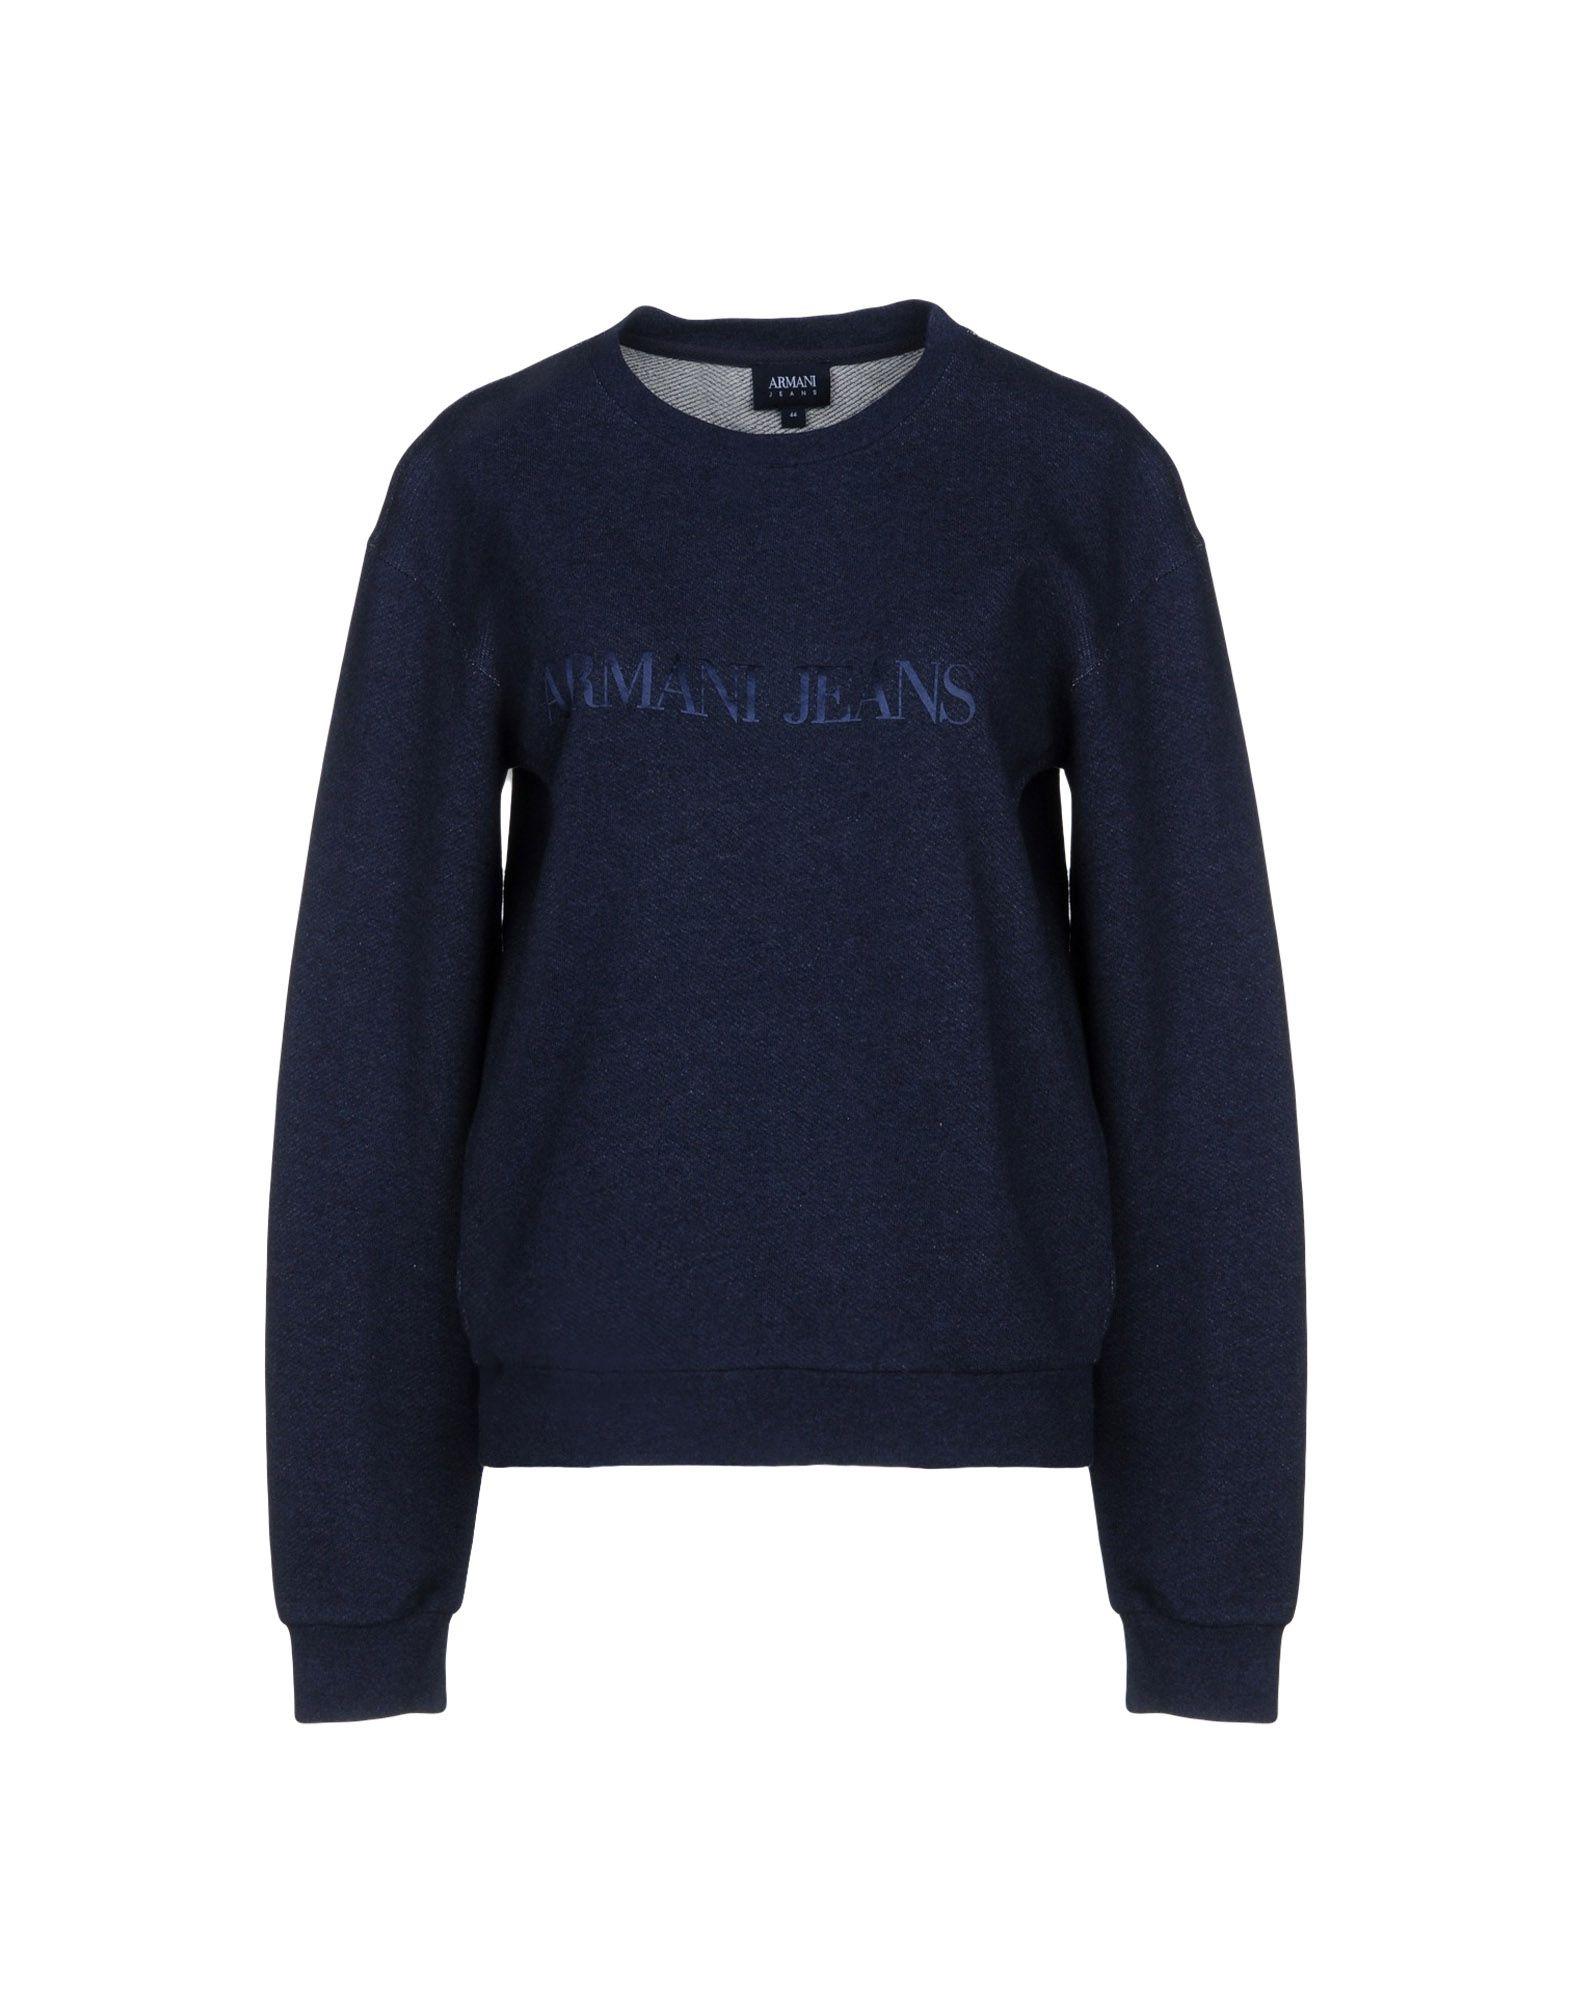 ARMANI JEANS Sweatshirt in Dark Blue